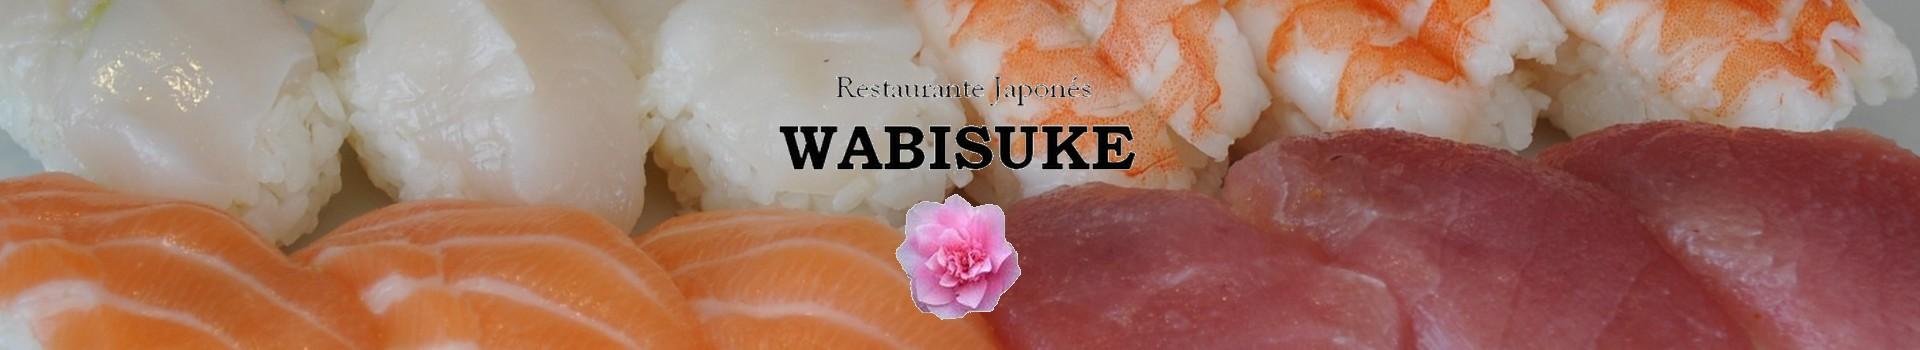 restaurante japones barato